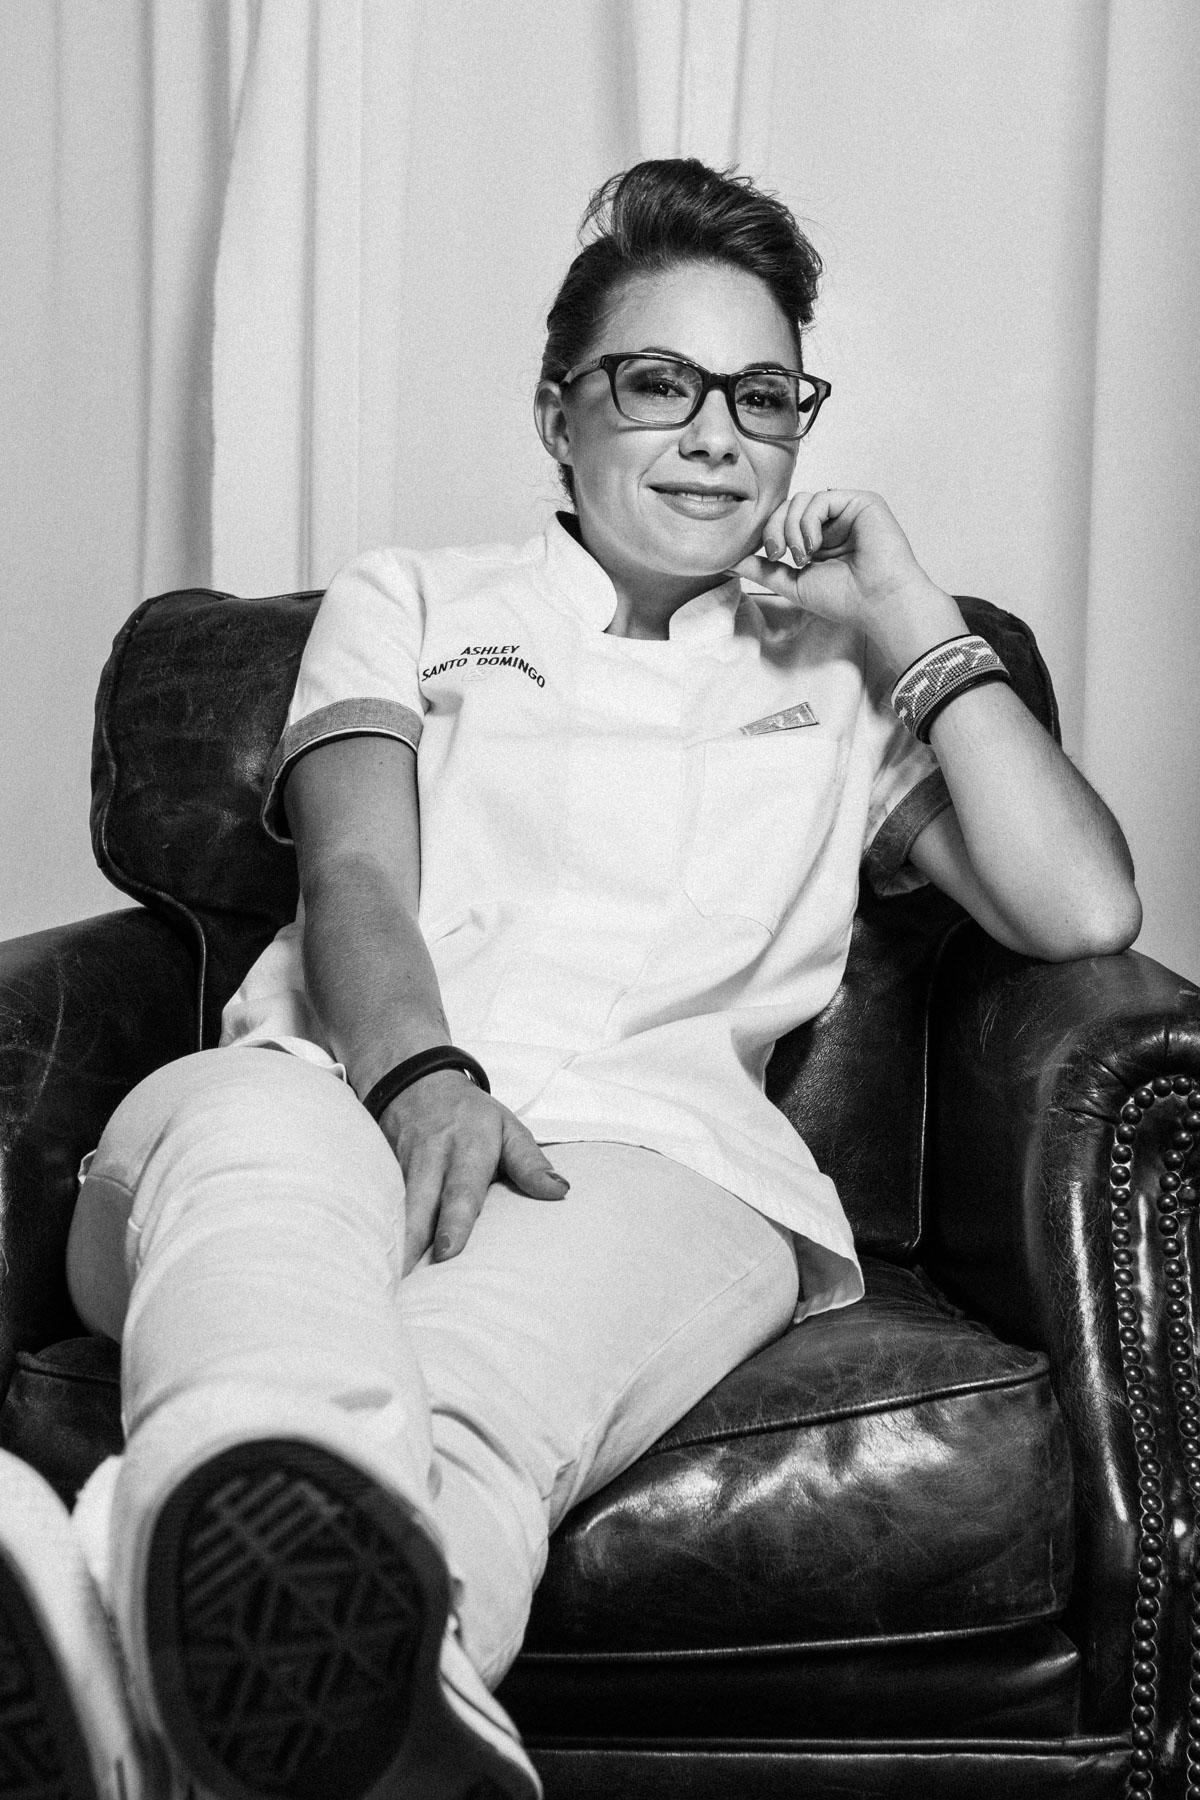 17. Chef Ashley Santo Domingo / 24 Carrots Catering & Events / Irvine, California